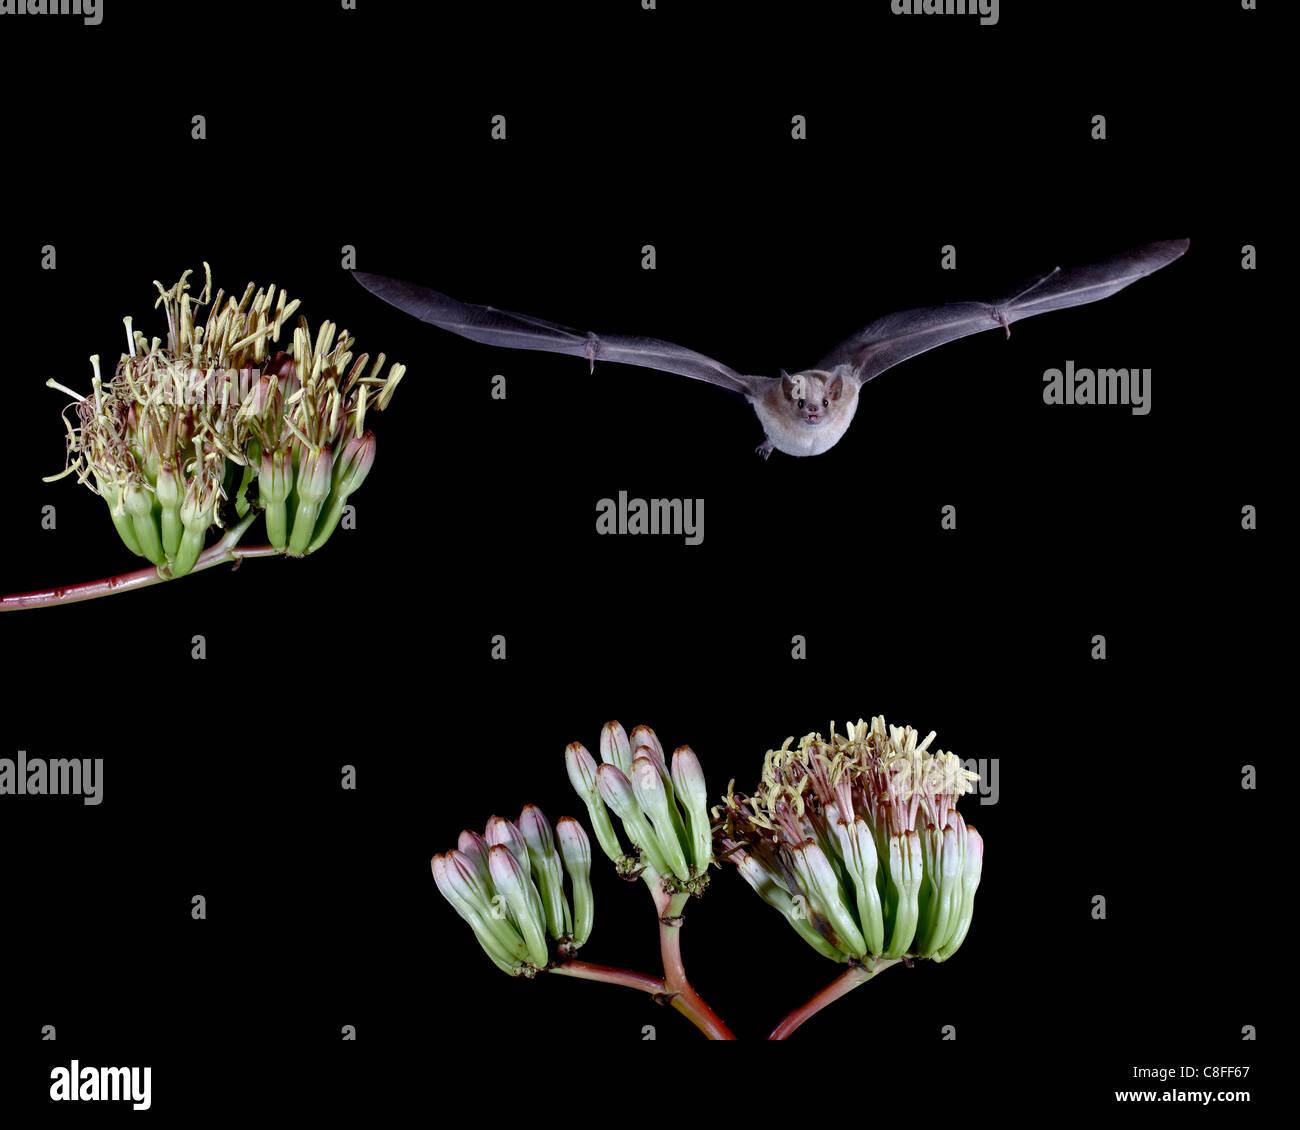 Lesser long-nosed bat (Leptonycteris yerbabuenae) flying by agave blossoms, in captivity, Hidalgo County, New Mexico, USA Stock Photo